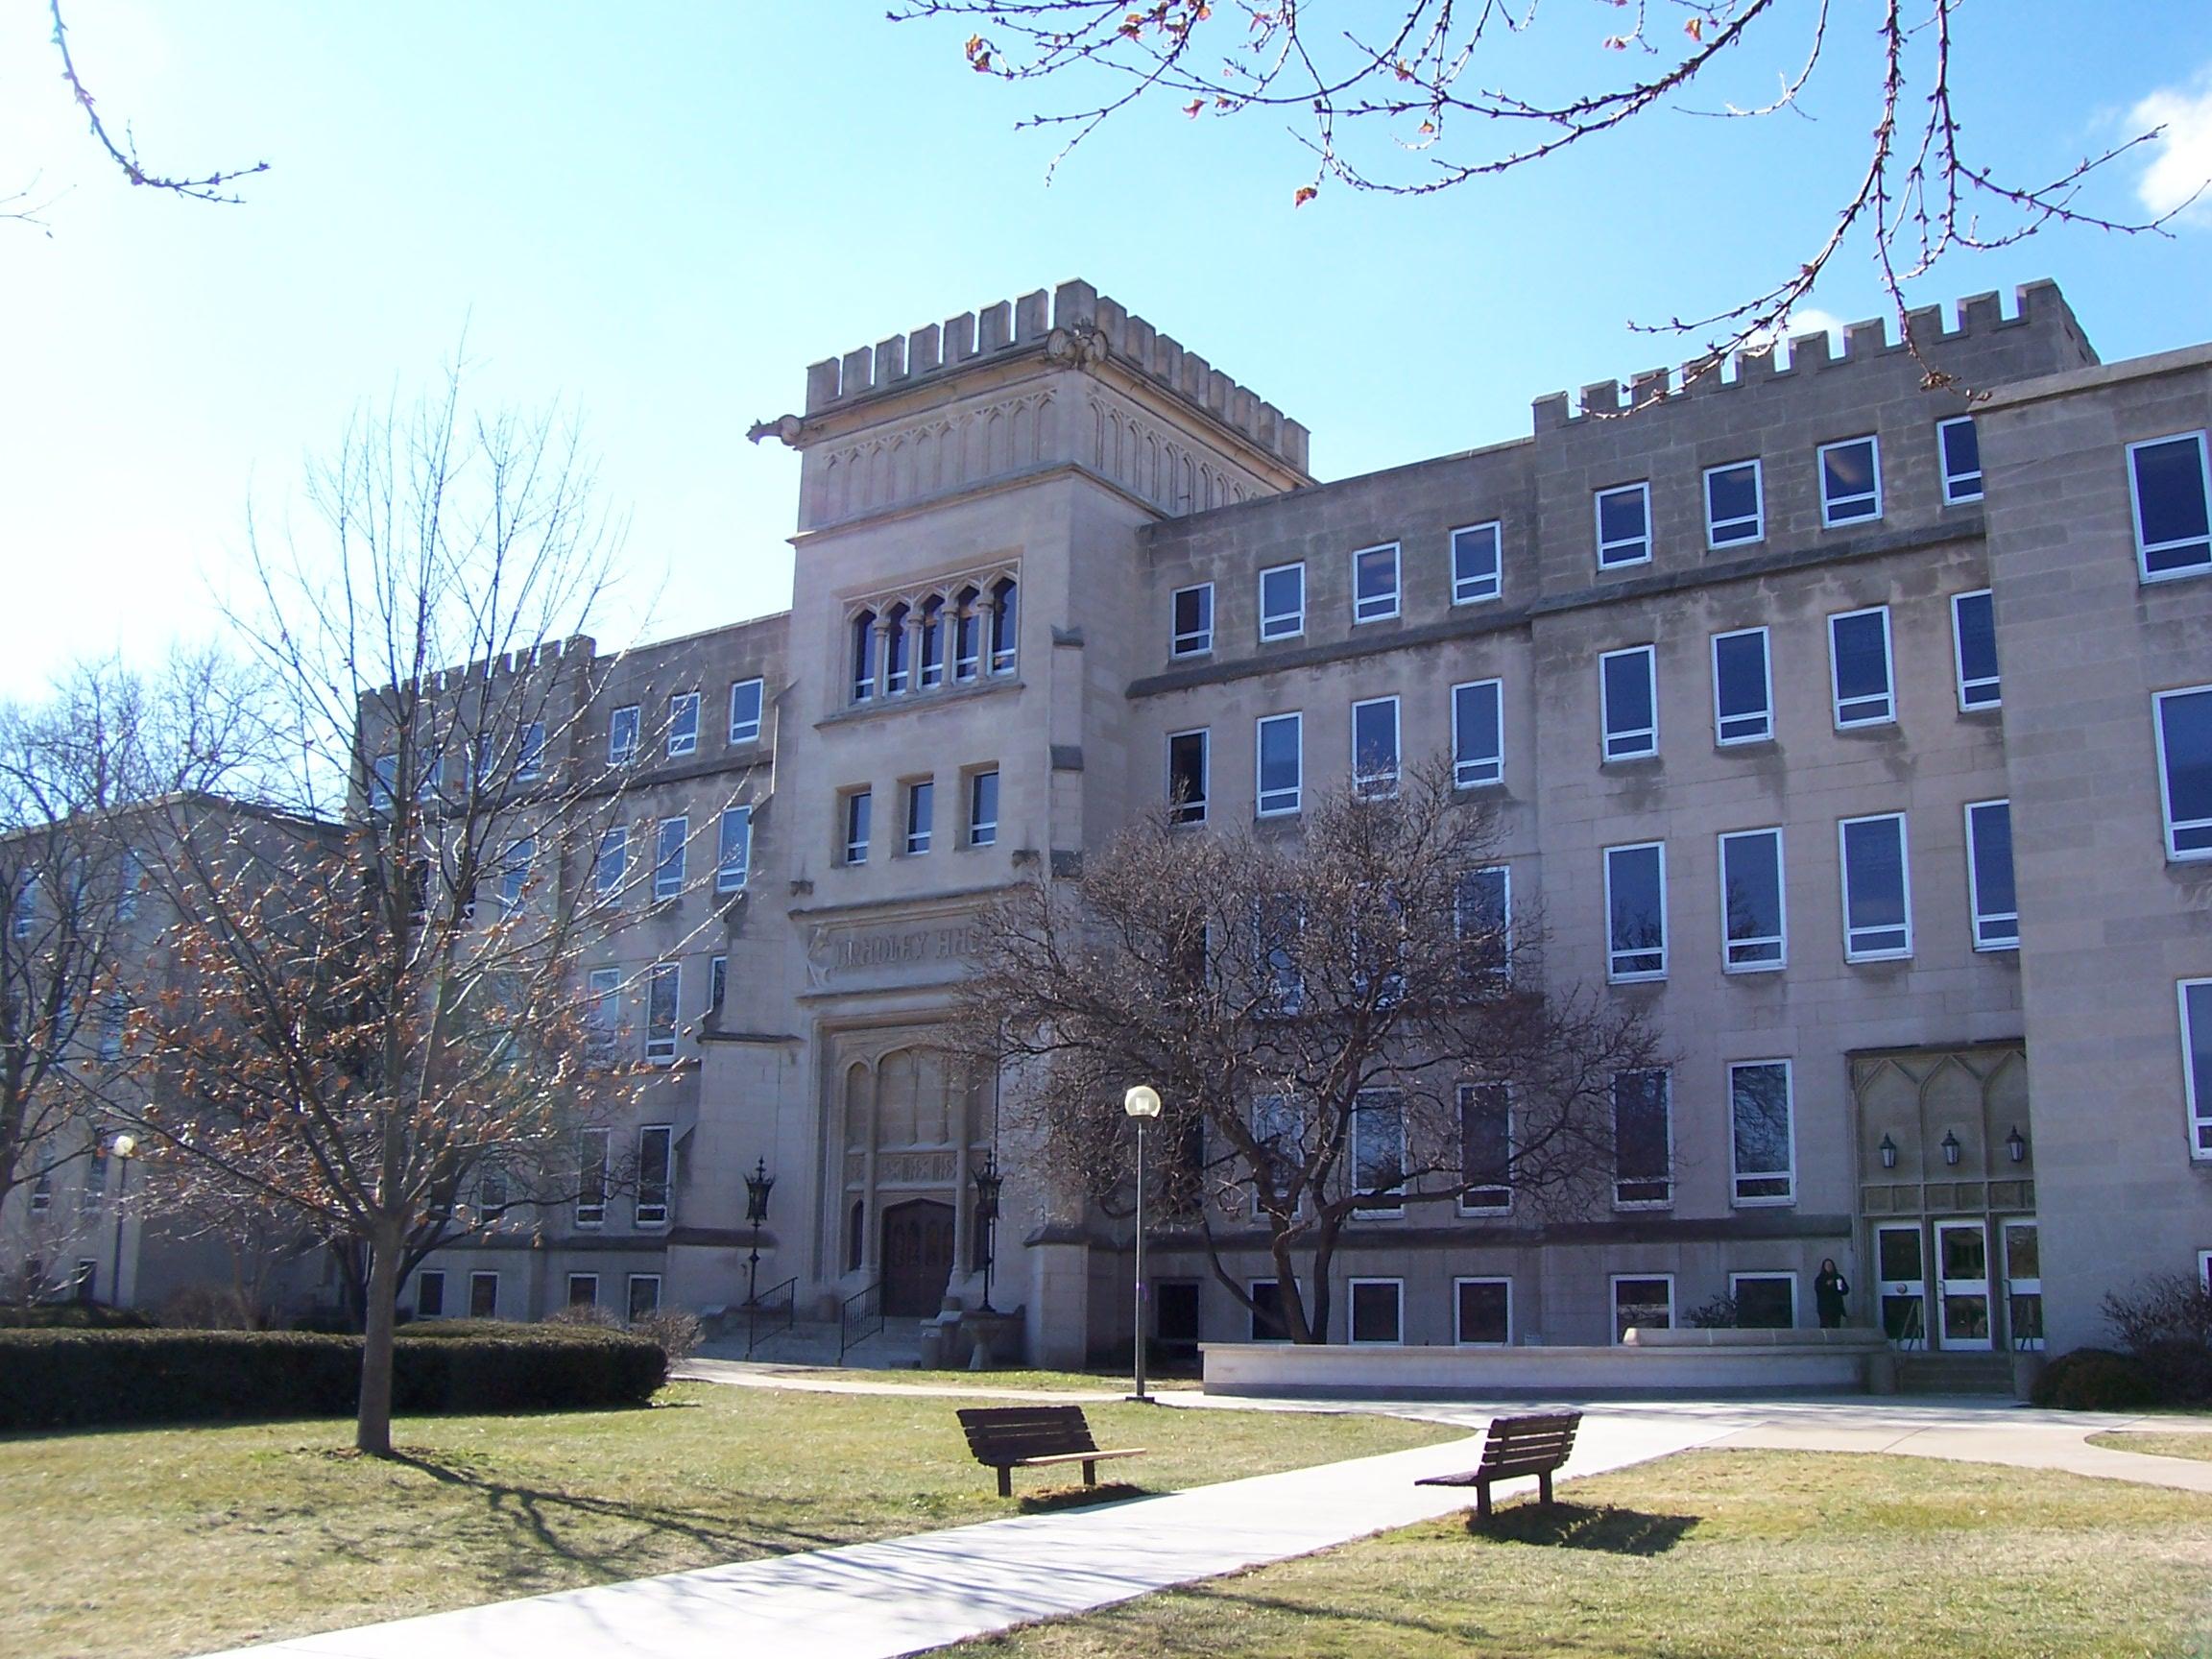 image of Bradley University